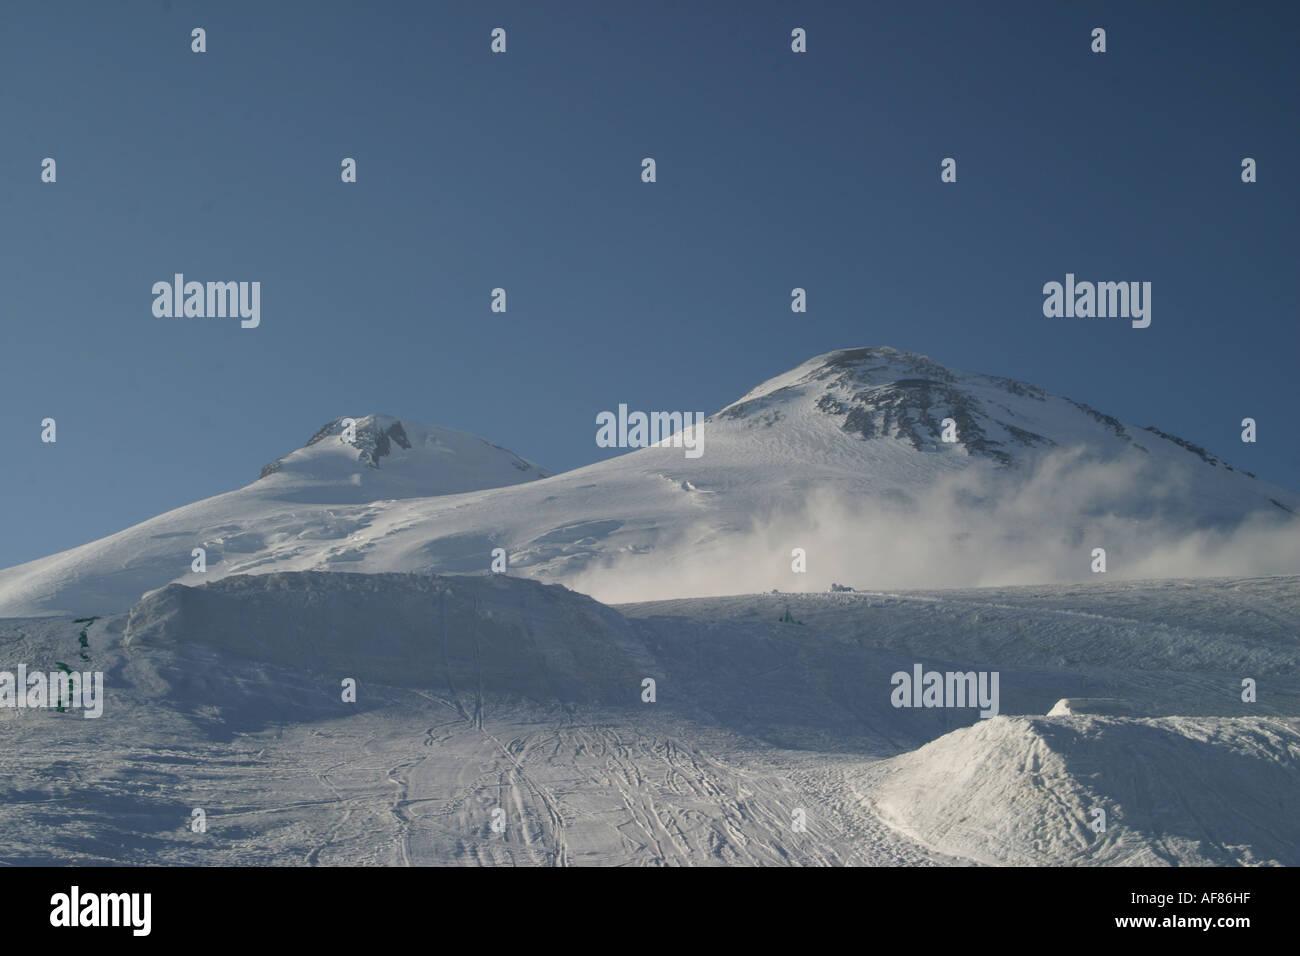 Mountains landscape 24 - Evening Elbrus in pure blue sky and snowboard big-airs, Caucasus, Elbrus region, Kabardino-Balkari - Stock Image